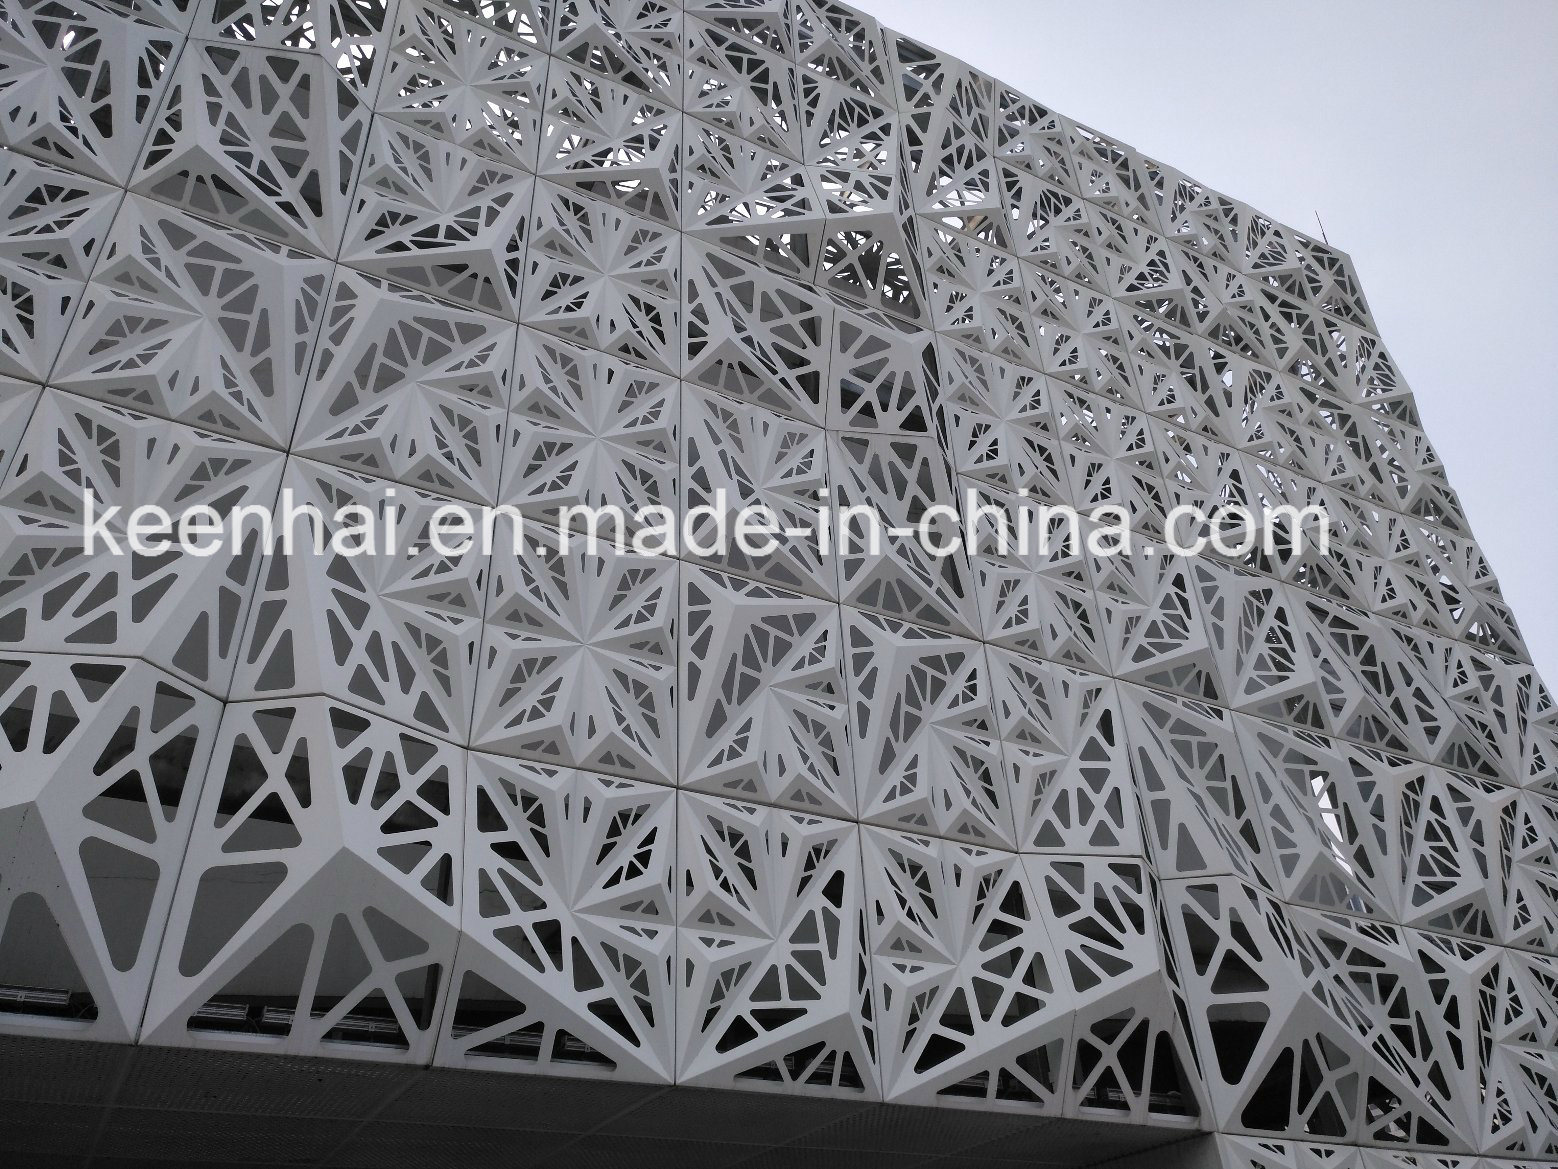 Perforated Aluminium Sheet Metal Modern Building Facade Panel